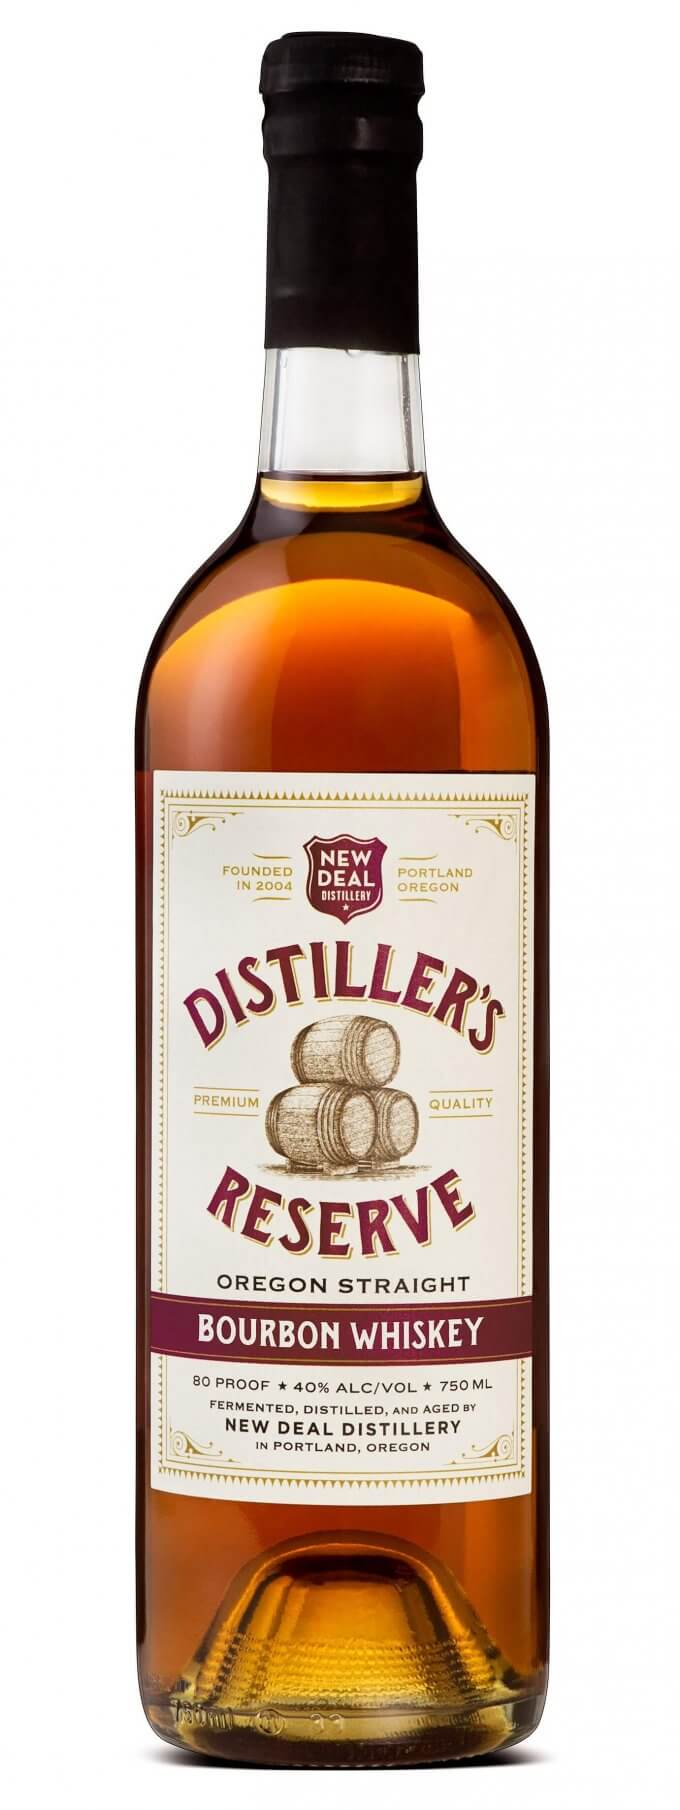 Oregon Bourbon - New Deal Distillers Reserve Oregon Straight Bourbon Whiskey